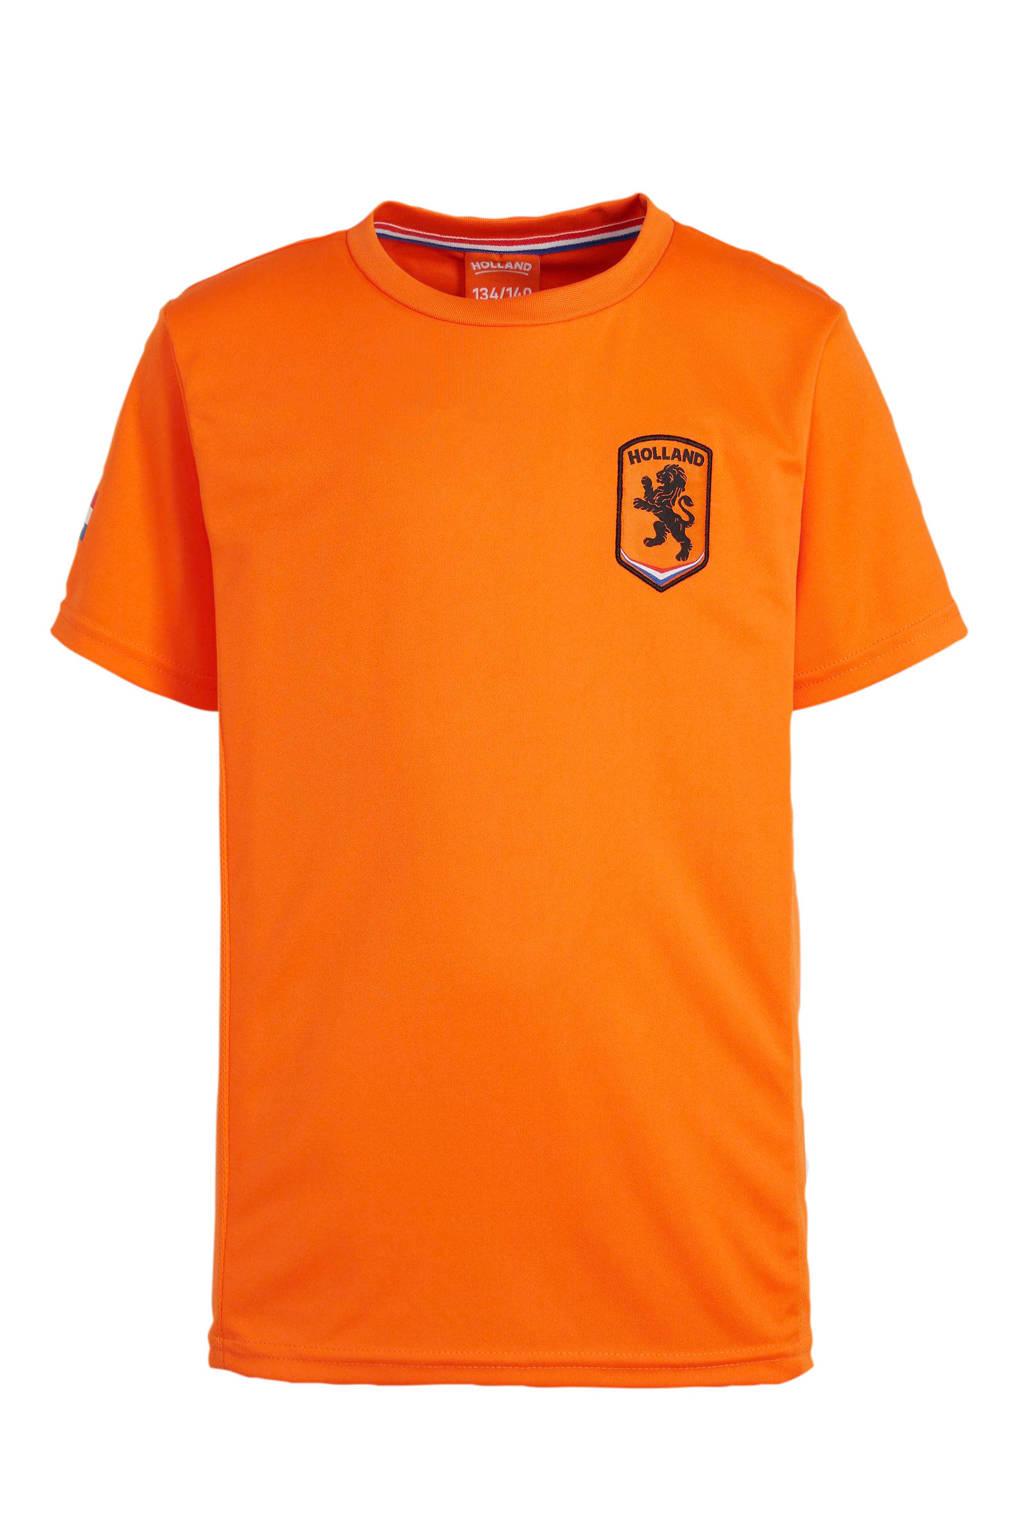 State of Football   Holland T-shirt oranje, Oranje